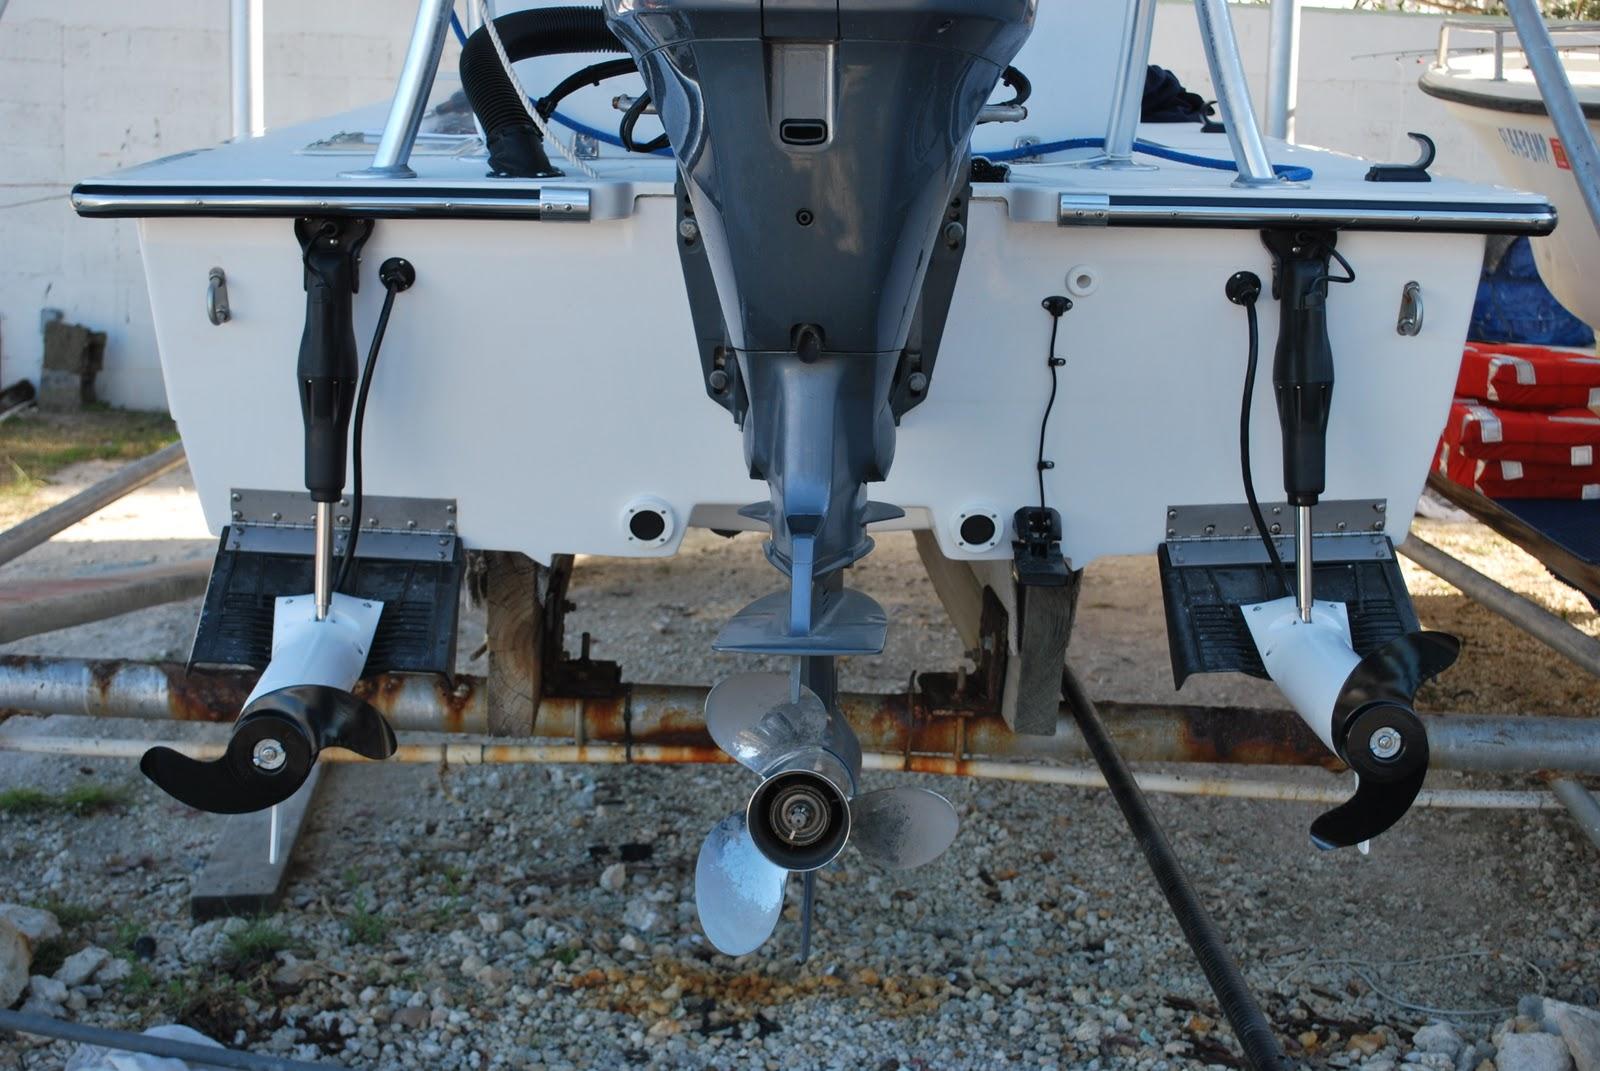 The key west flats angler minnkota trim troll install for Outboard motor trim tab